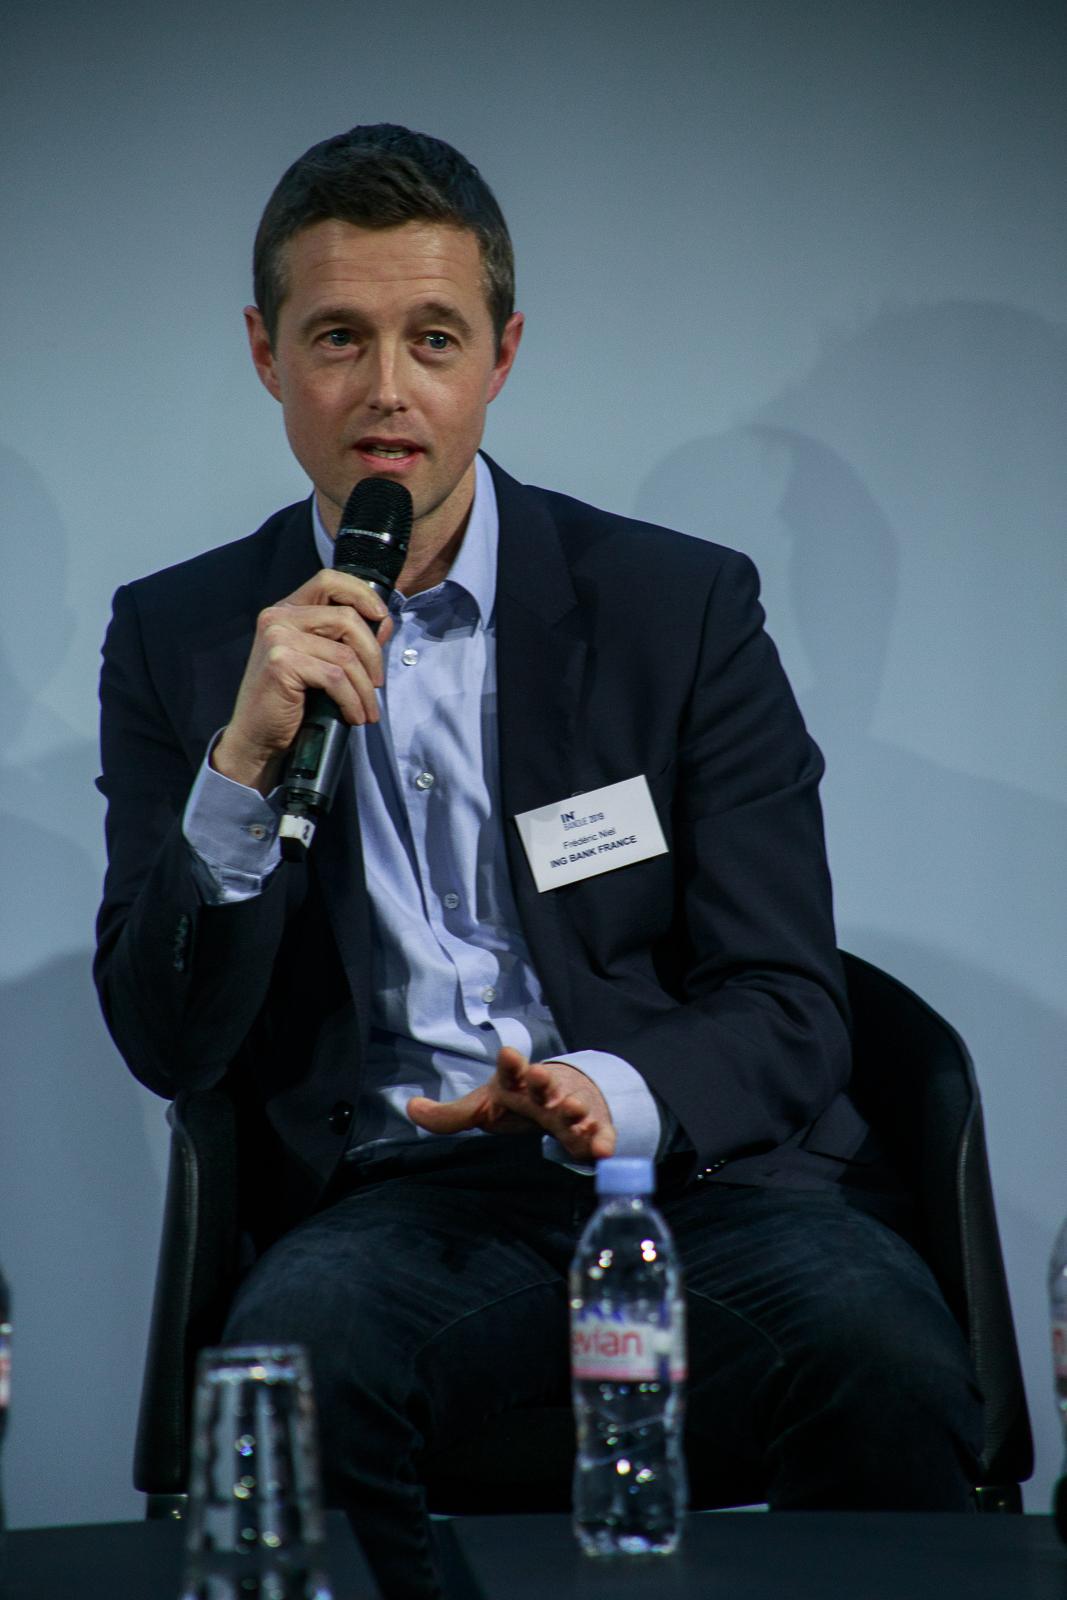 Frédéric Niel (ING Bank) IN BANQUE 2019 - Crédit photo : Guillermo Gomez